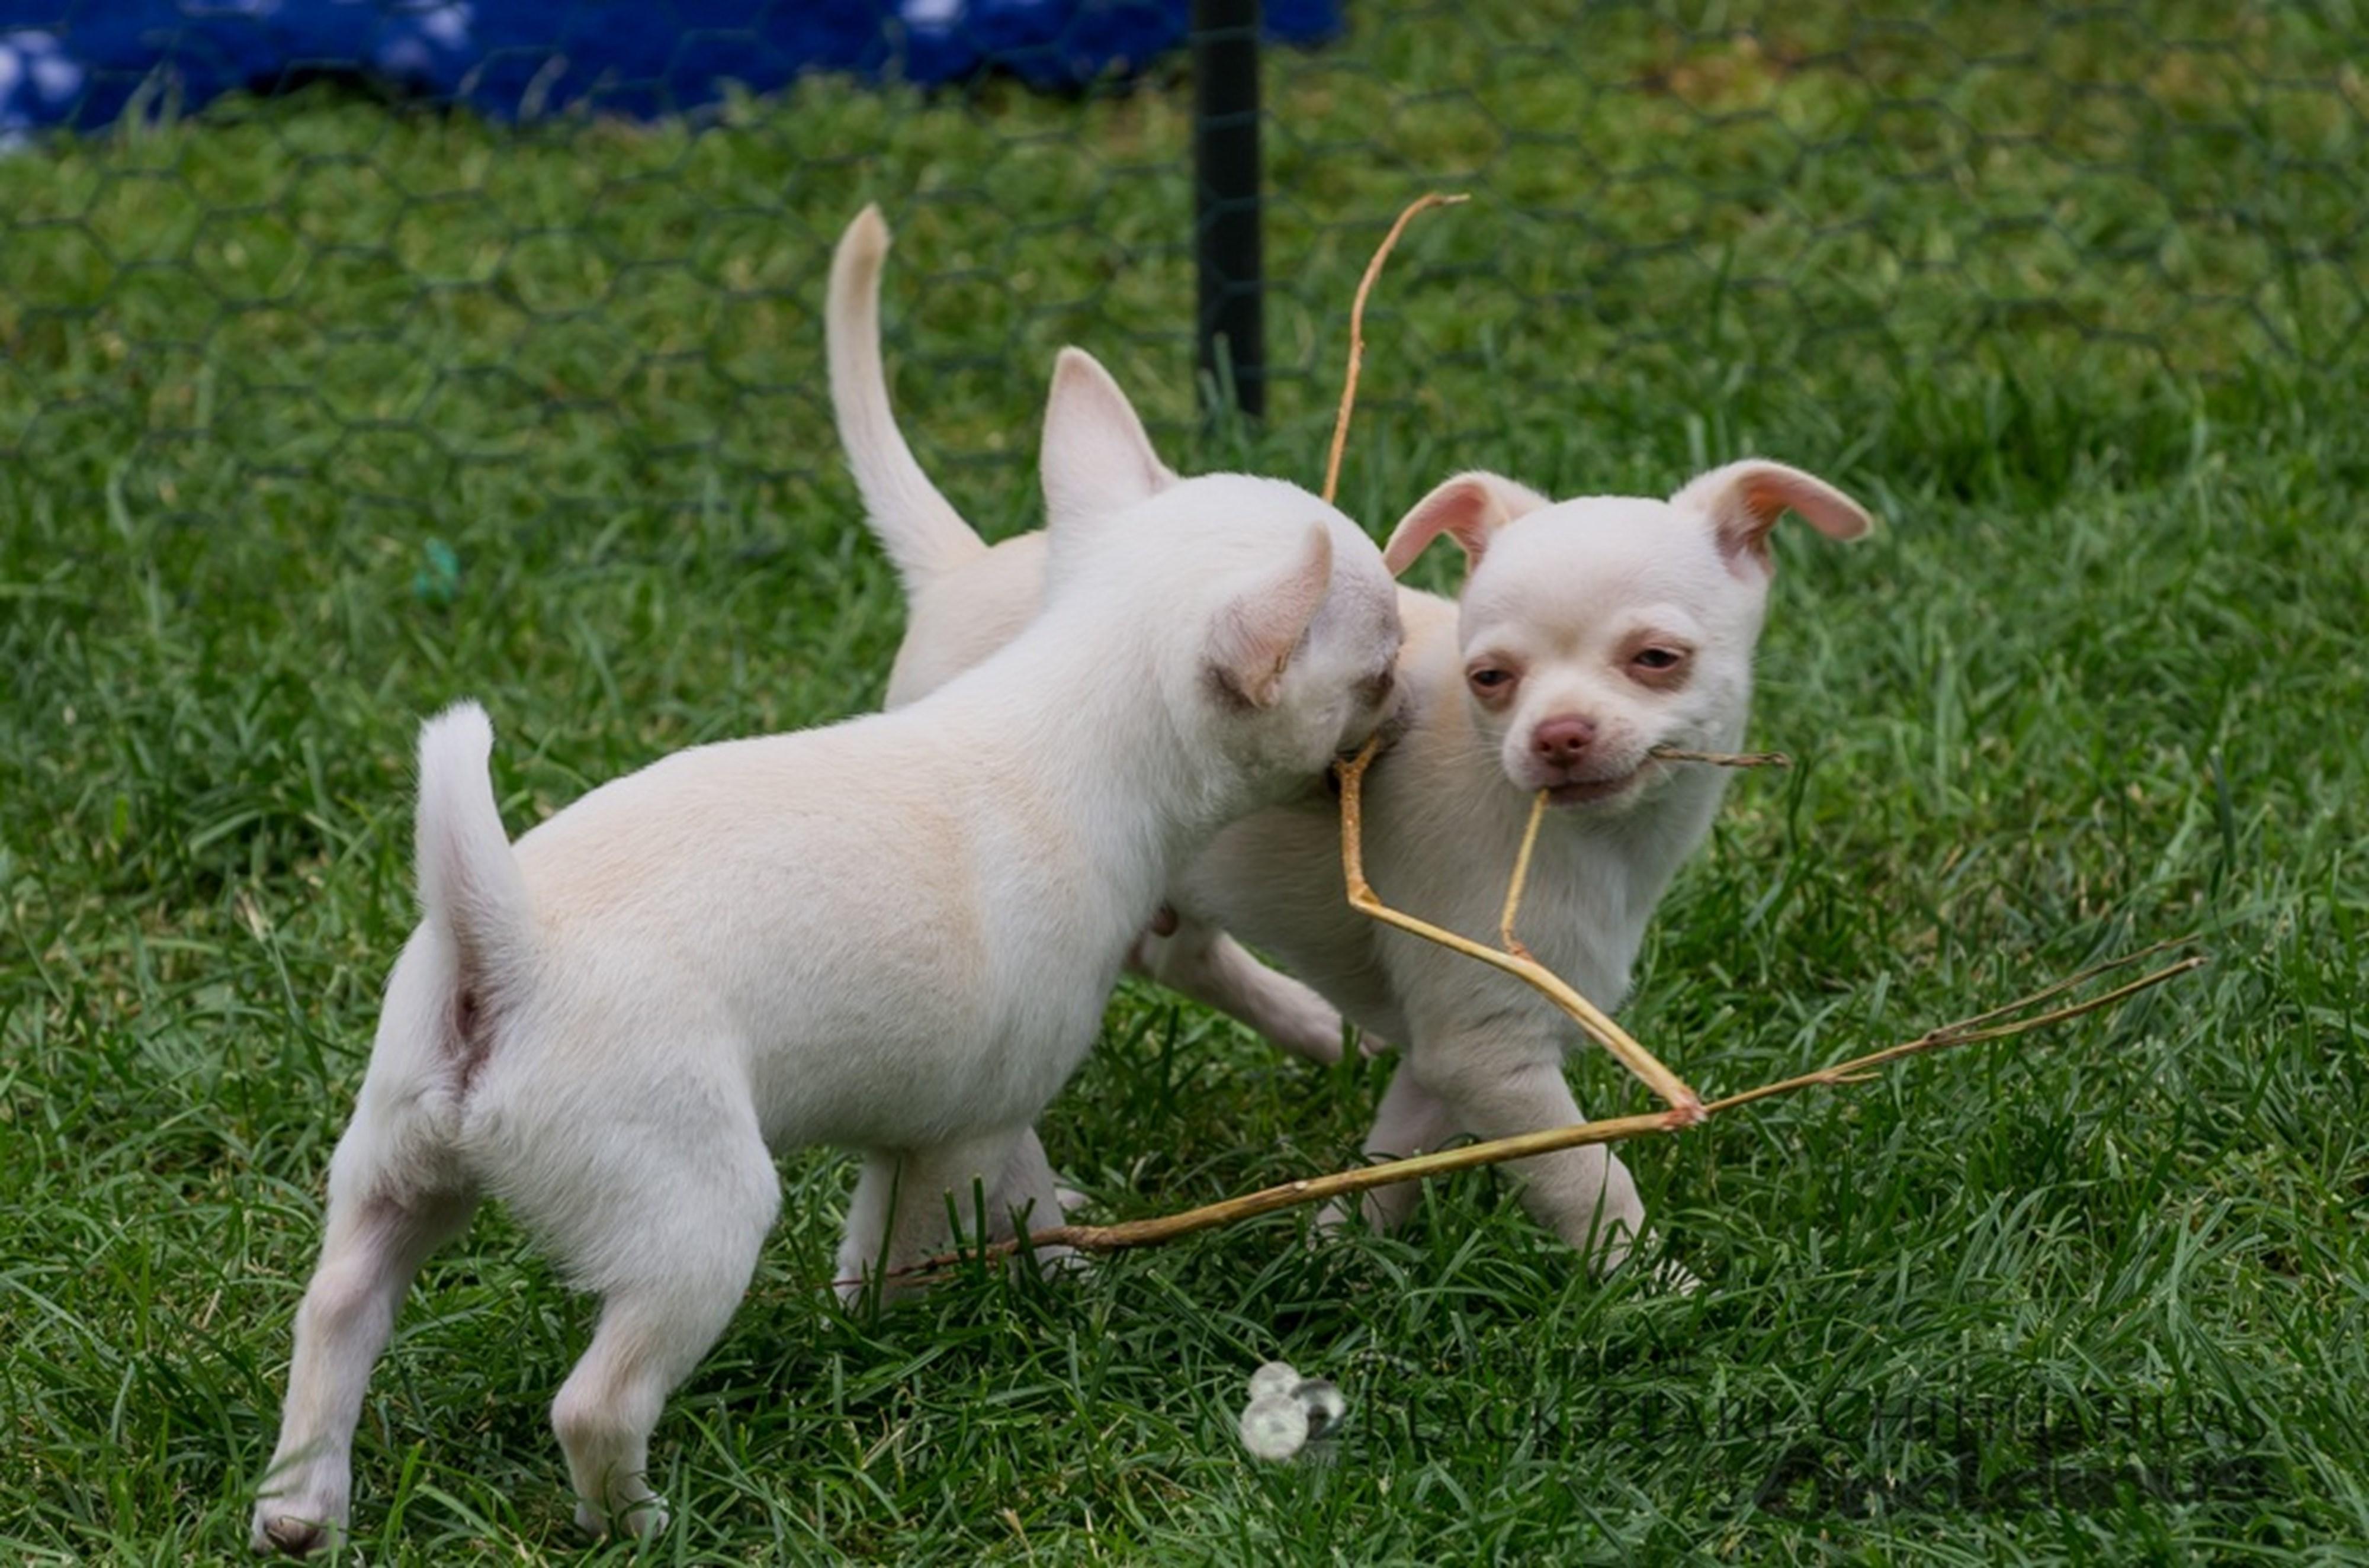 Galerie Schweizer Chihuahua Zucht Black Pearl Chihuahuas